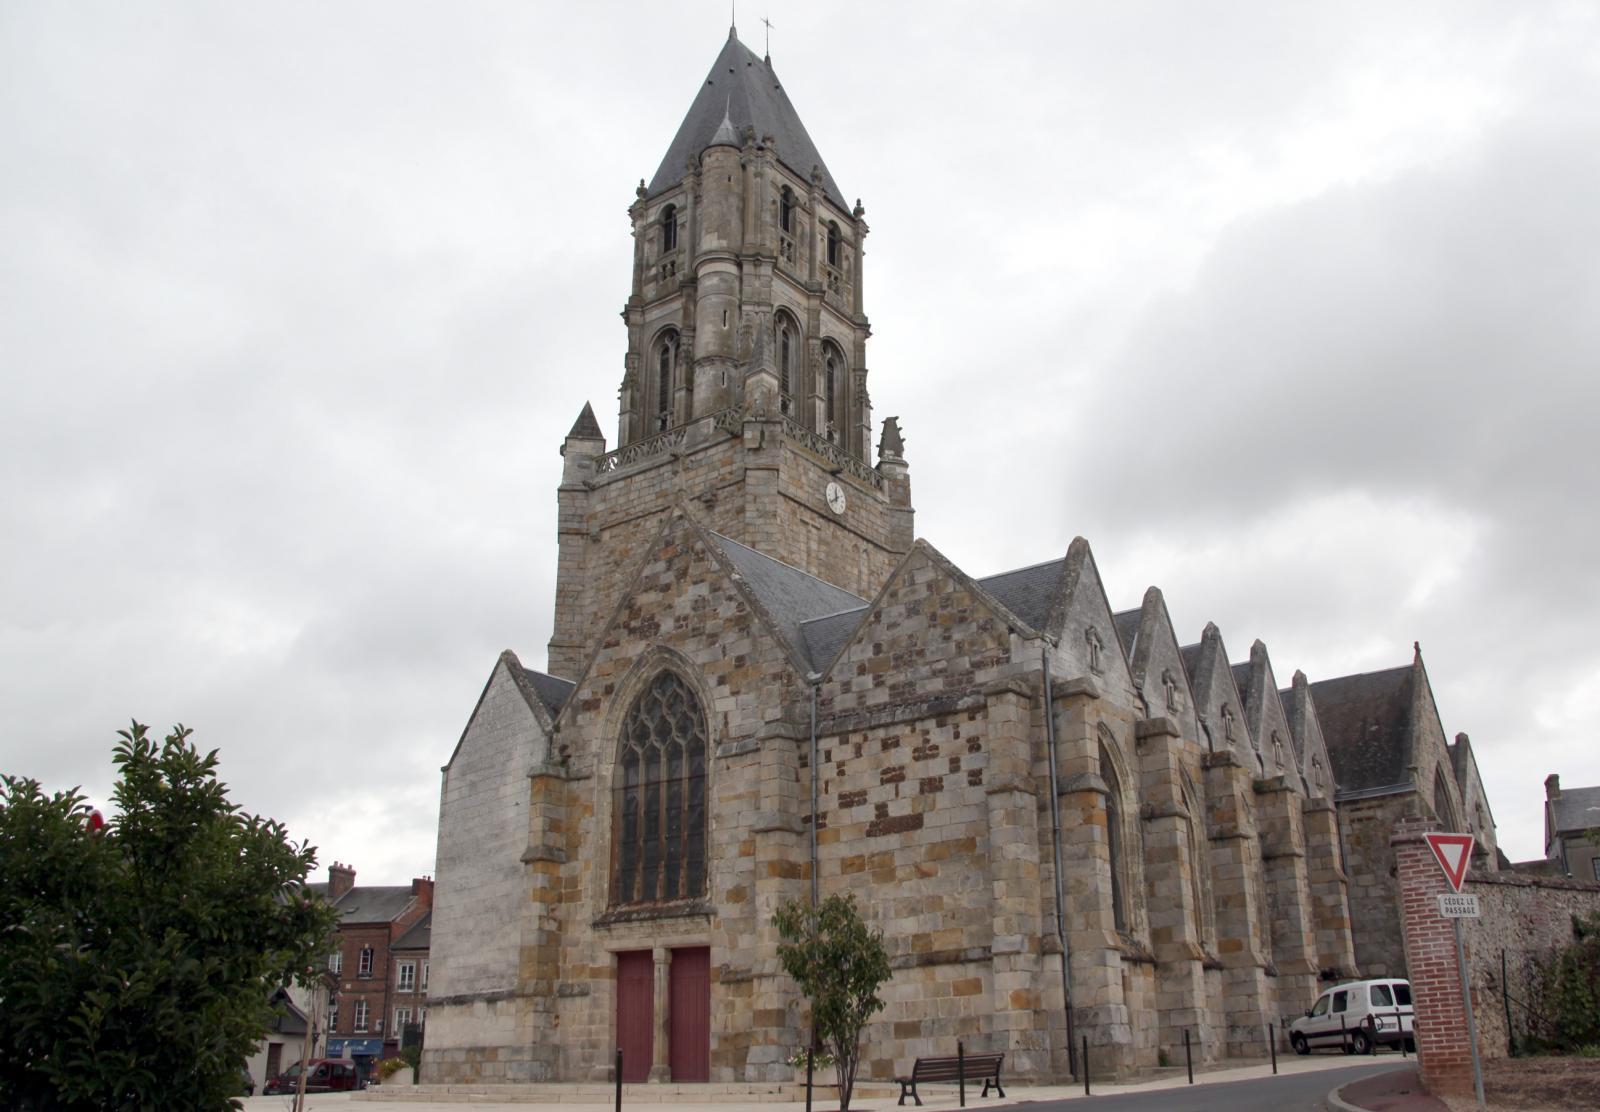 Eglise Notre-Dame d'Orbec